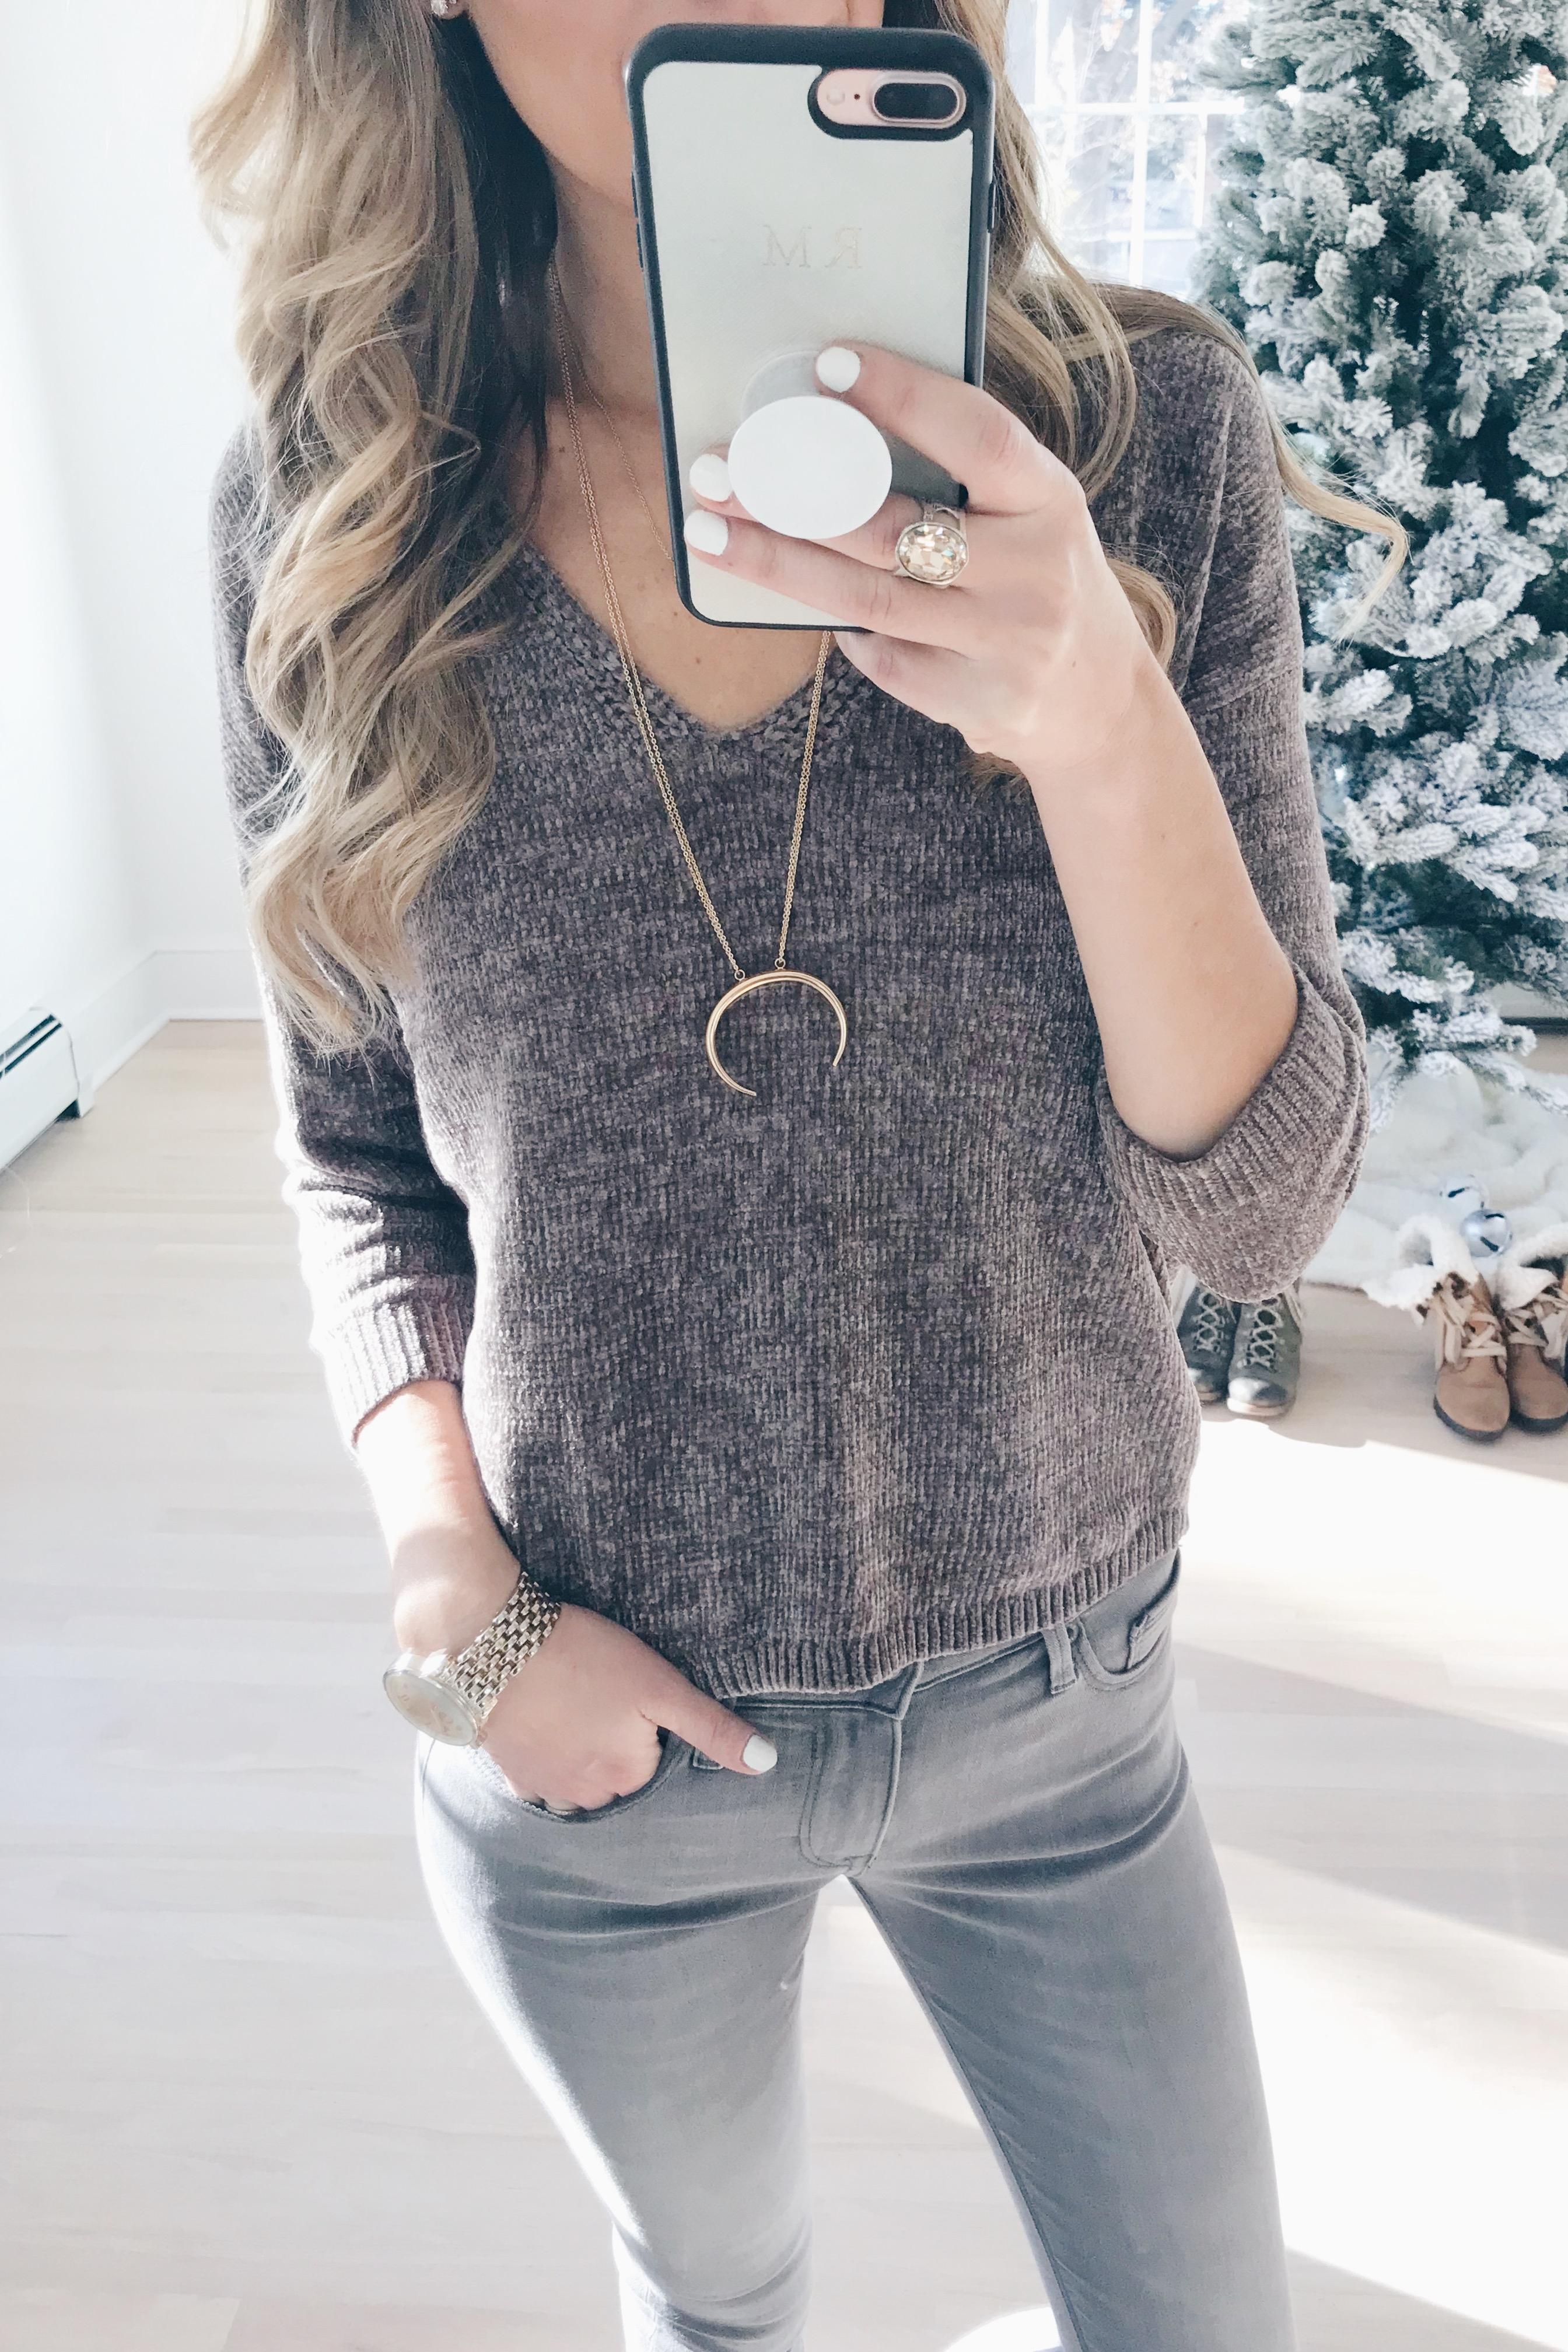 veteran's day weekend sale round up 2018 v-neck women's chenille sweater